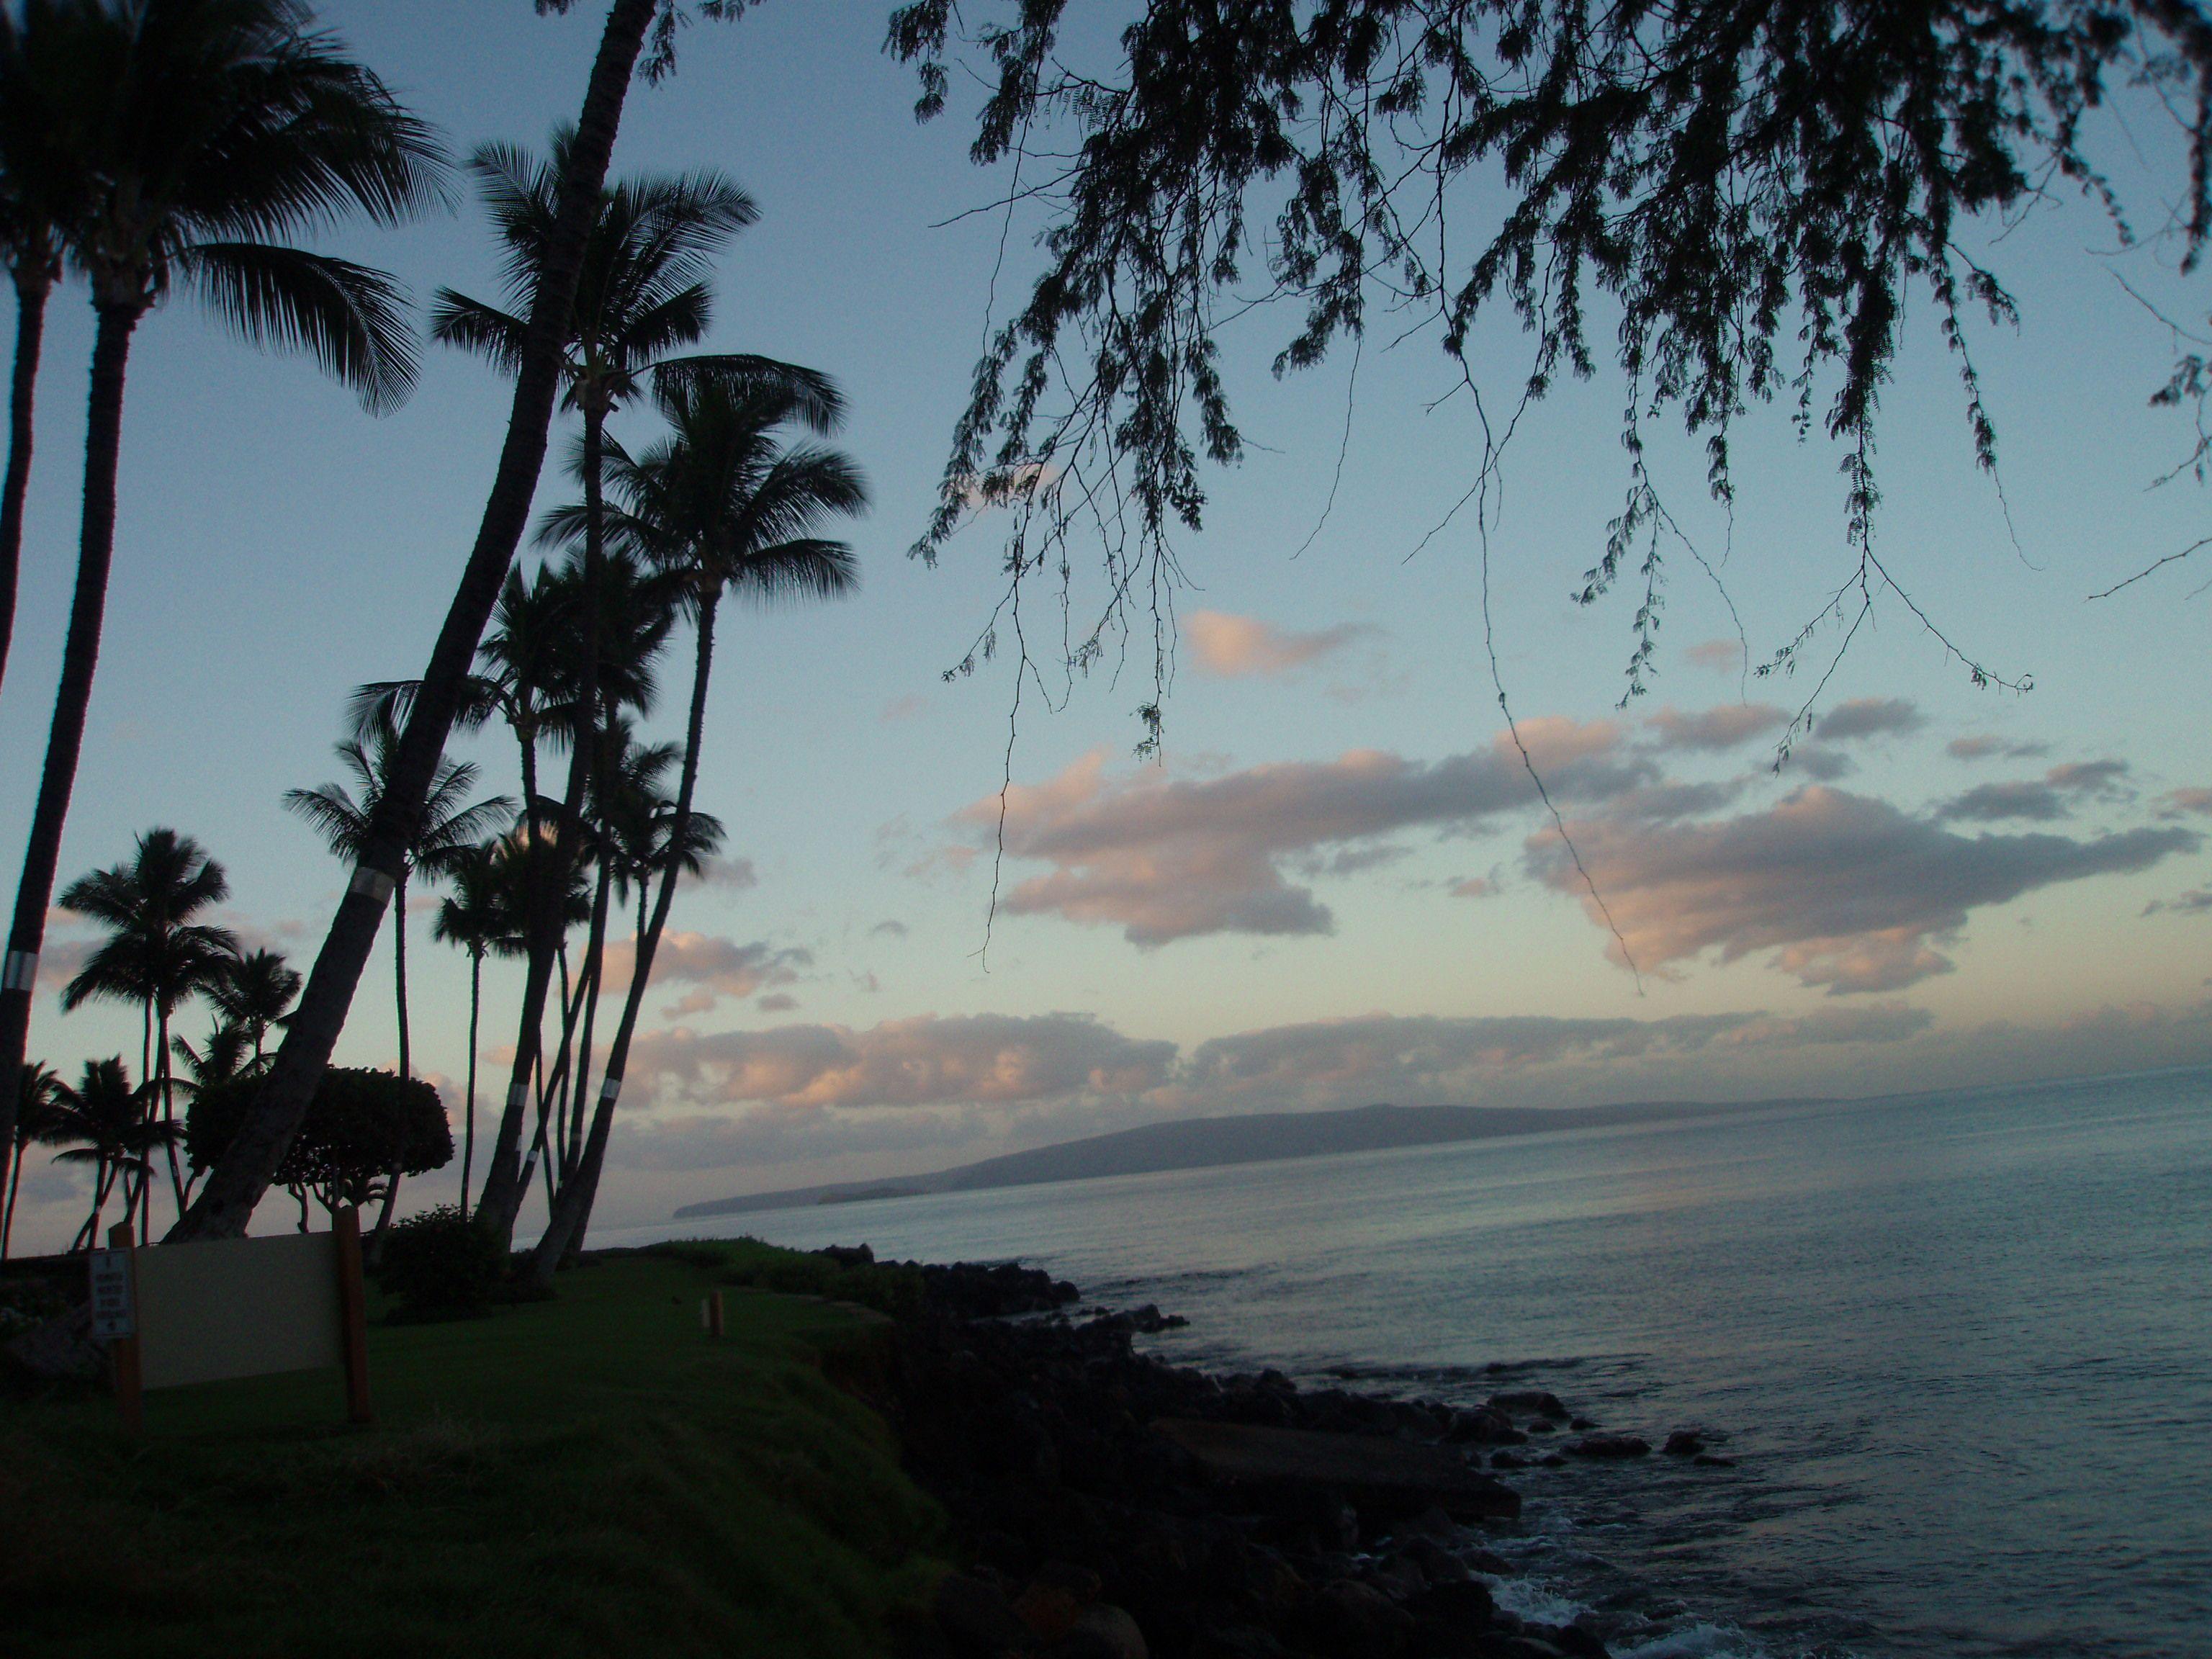 Sunset at Kamaole Park across from Worldmark, Kihei, Maui.  January 2007